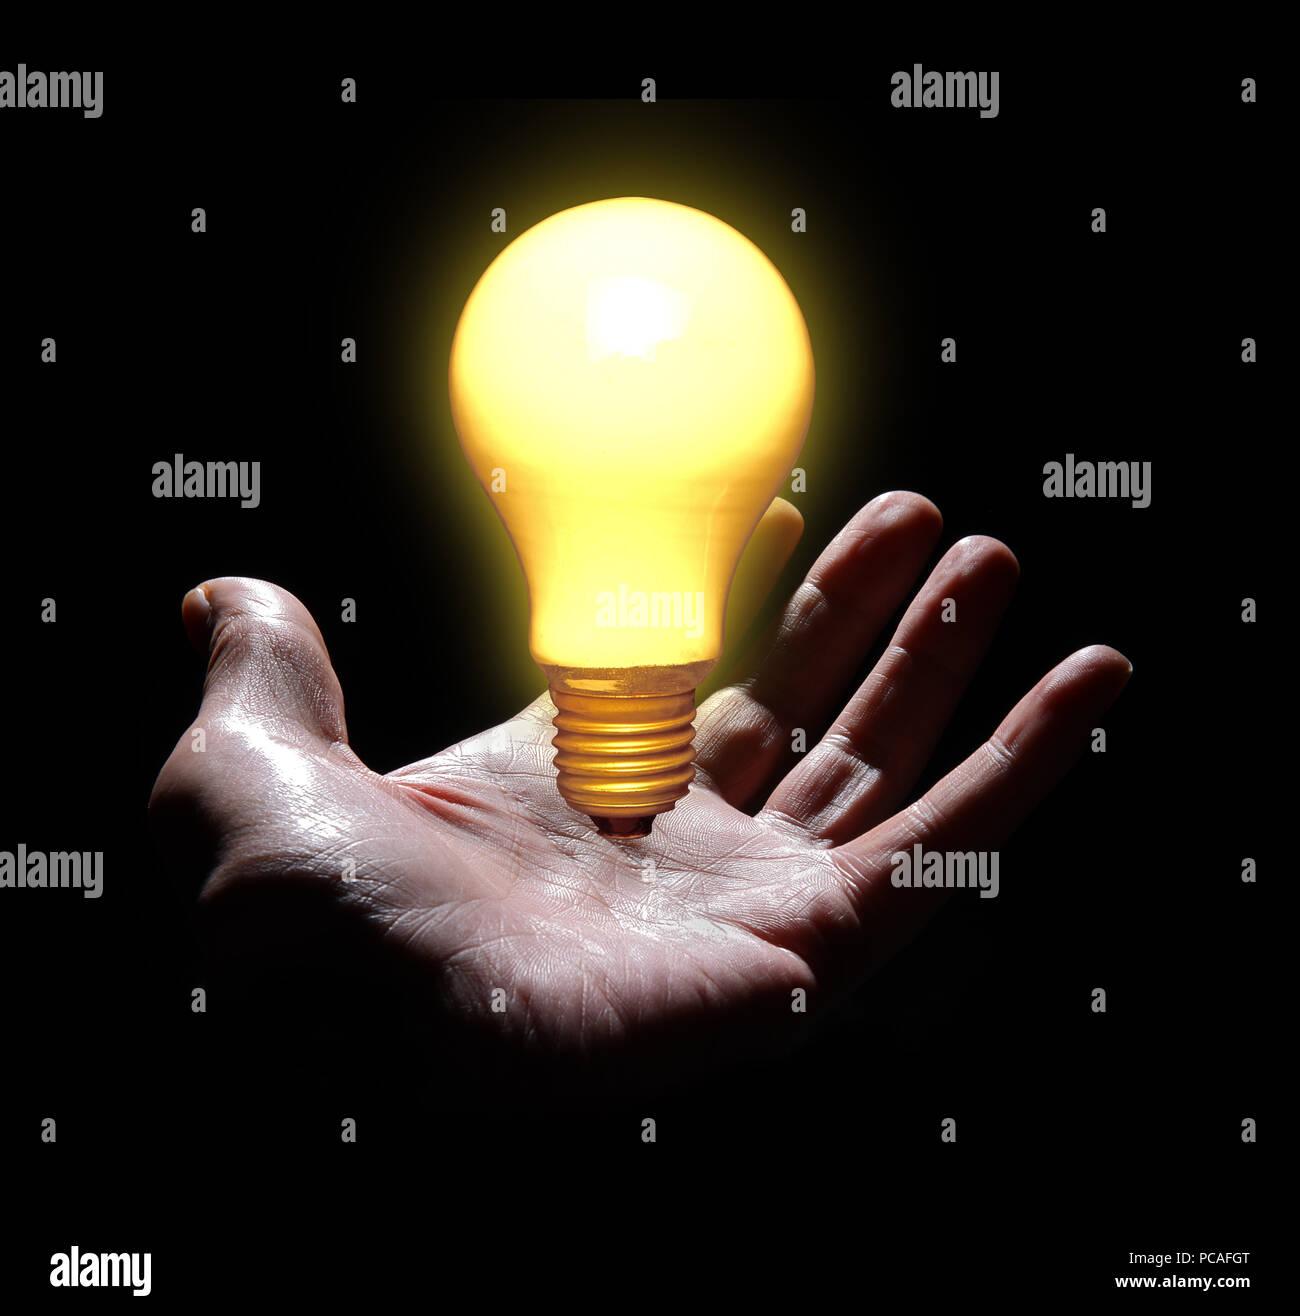 Hand and lightbulb. - Stock Image